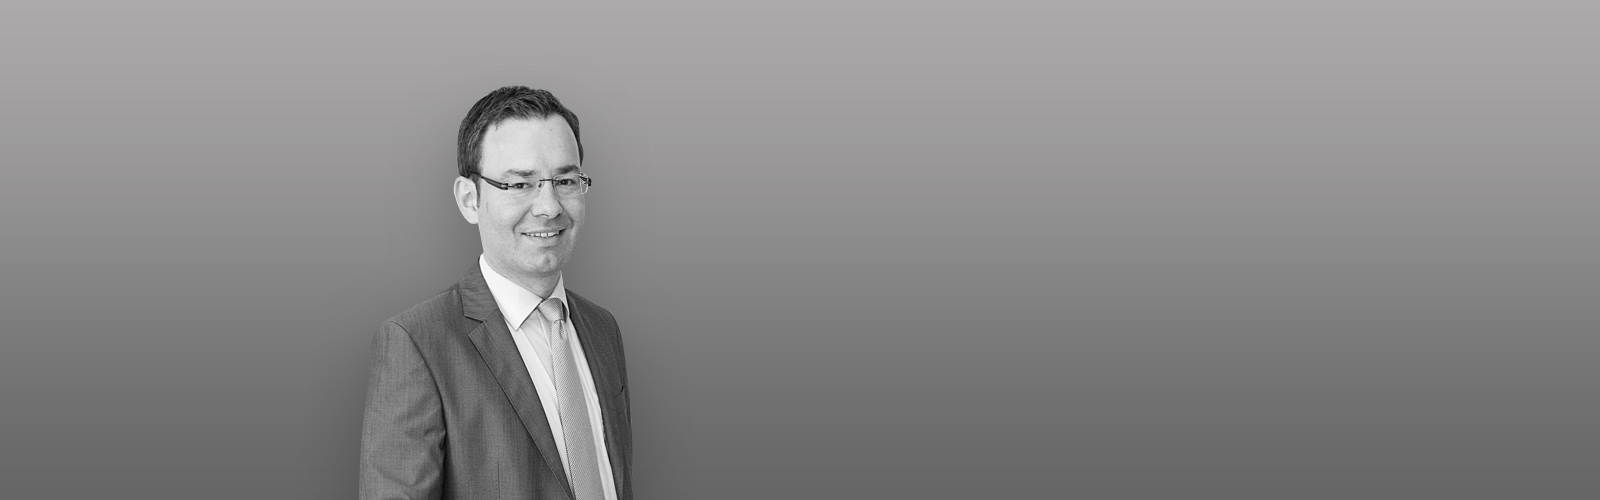 Rechtsanwalt Michael Klopfer